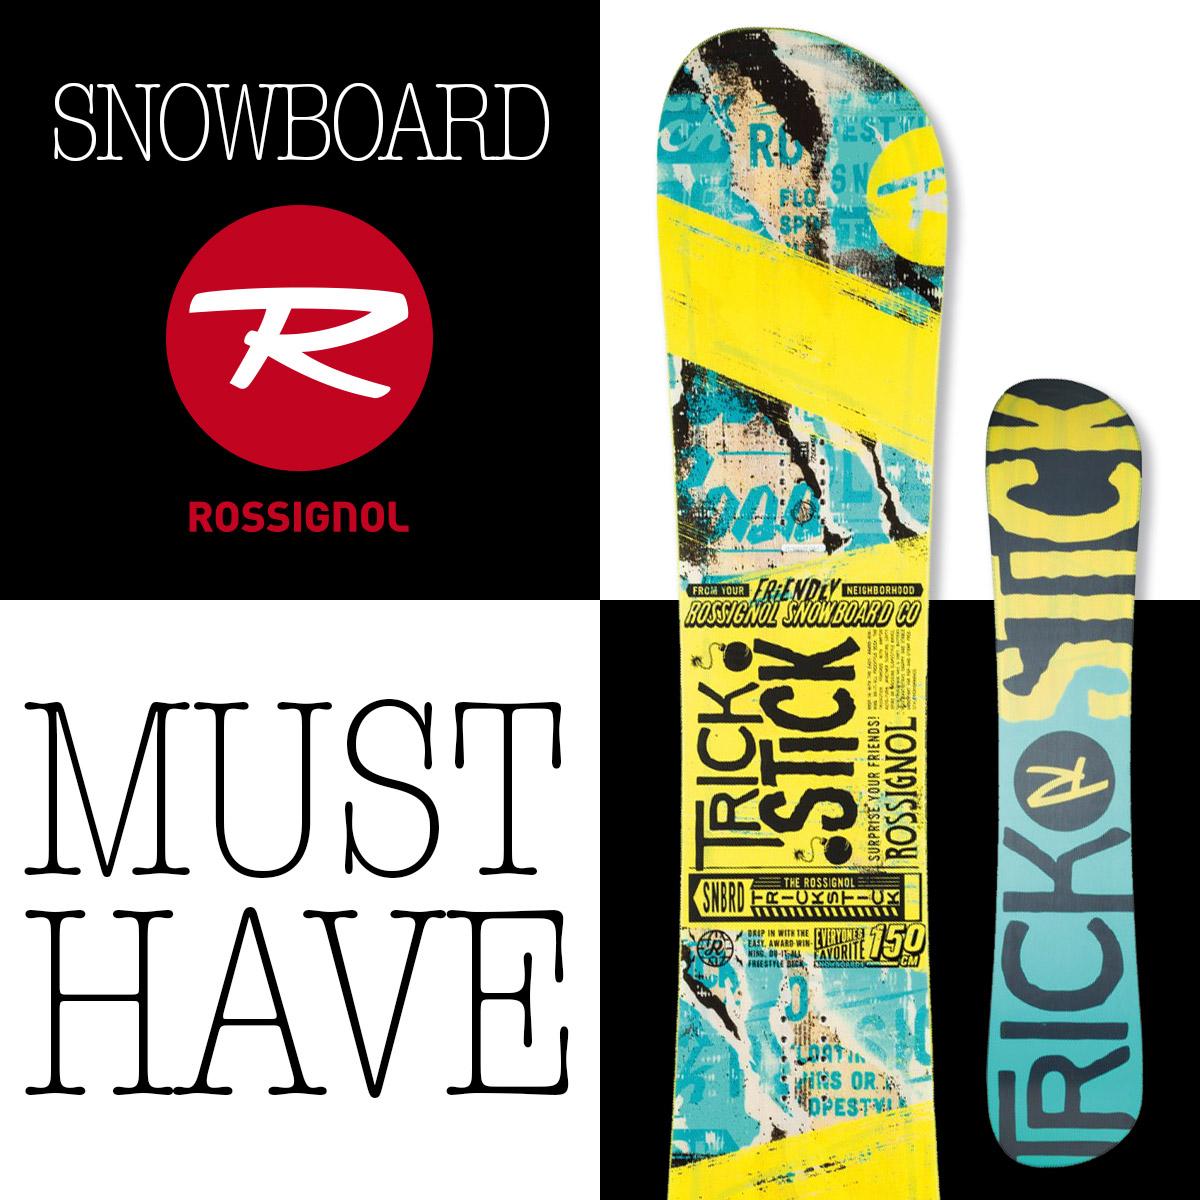 Promo Snowboard Rossignol Sconto 50